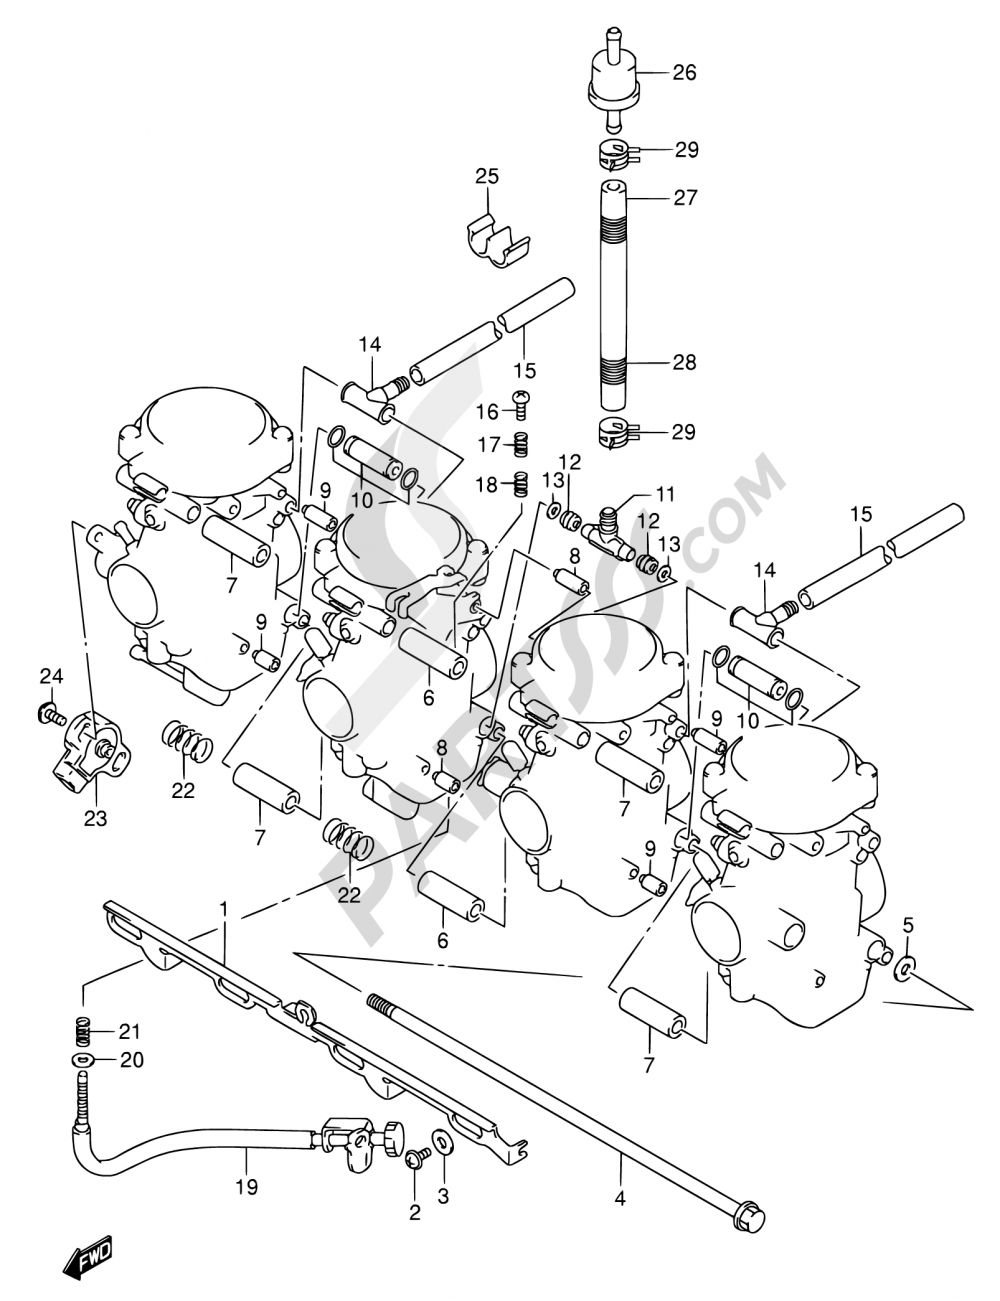 14 - CARBURETOR FITTINGS Suzuki GSX750F 2005